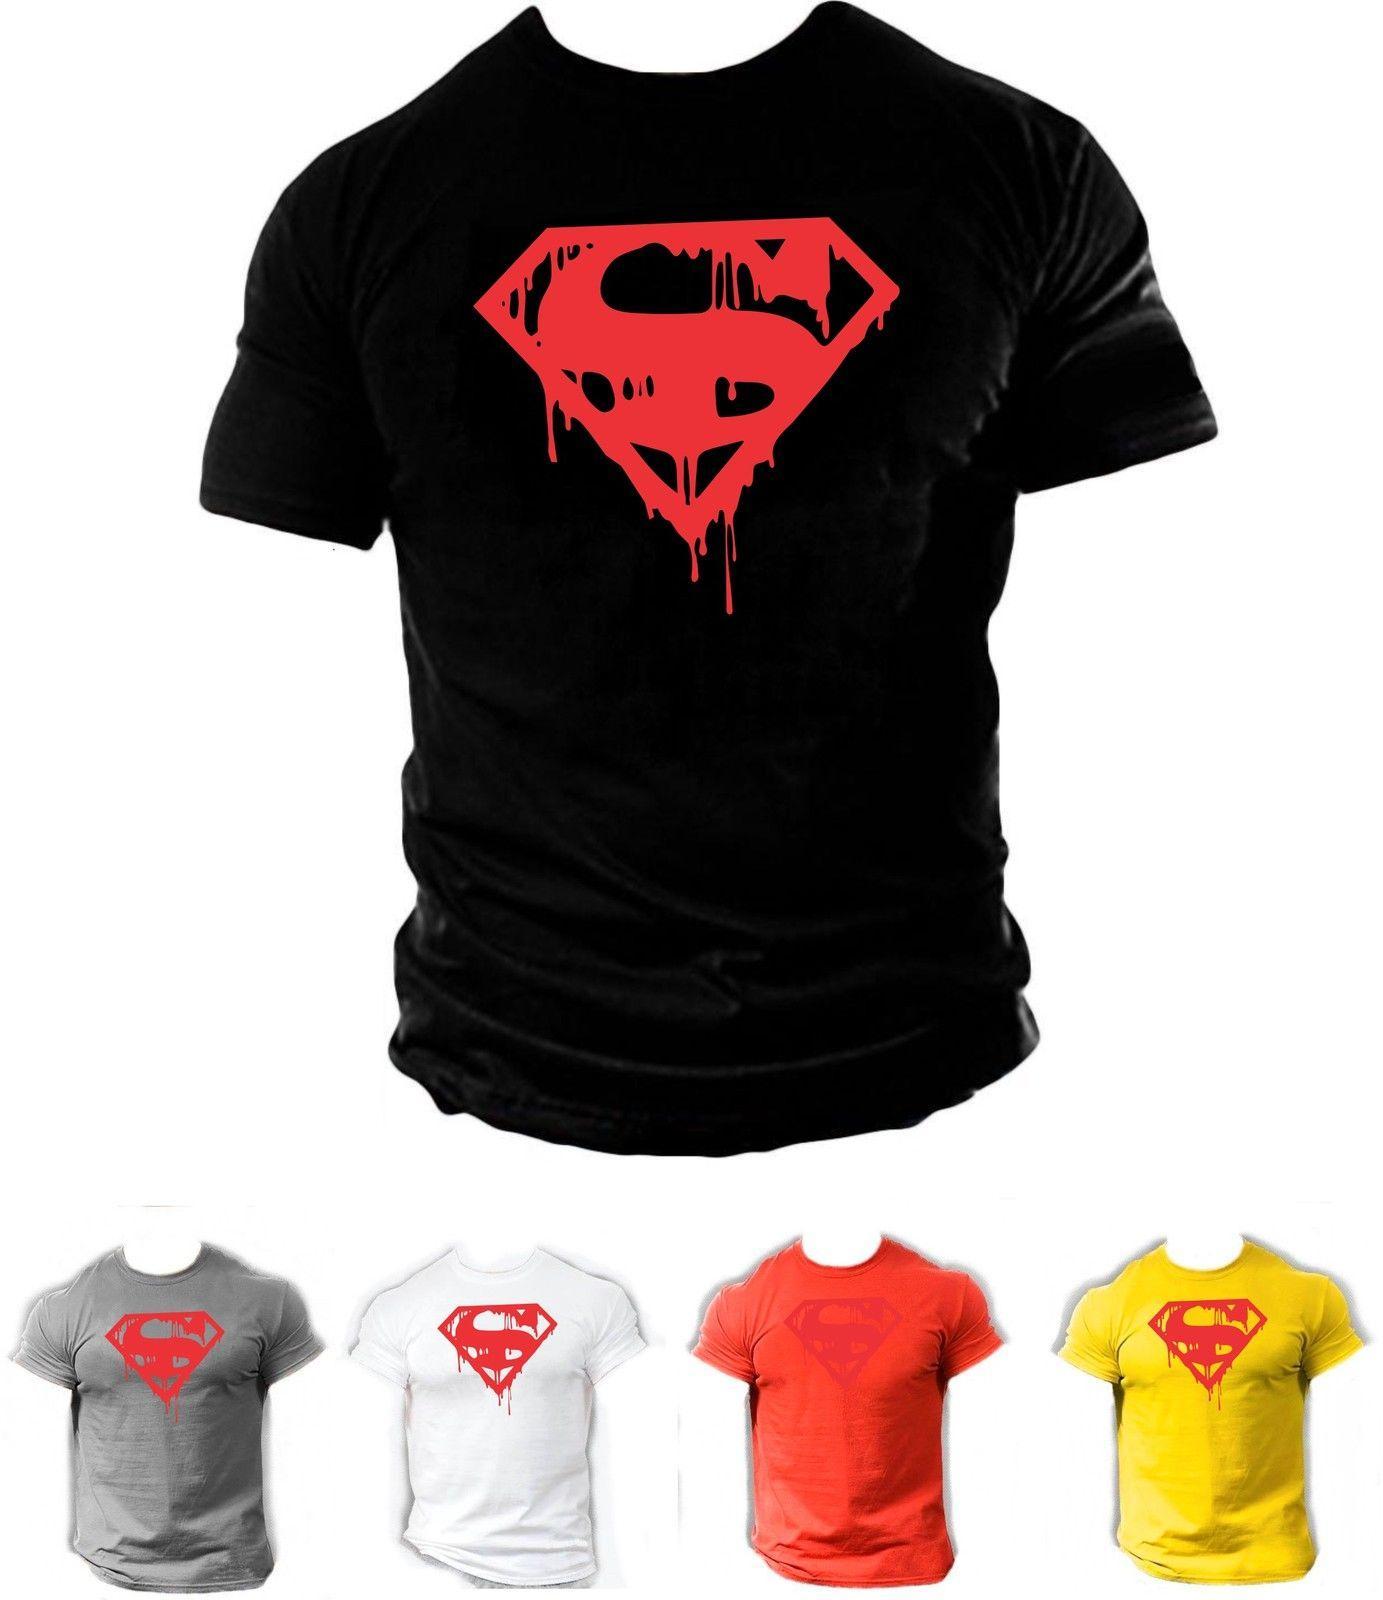 c99edd53 Mens MMA GYM BODYBUILDING MOTIVATION T Shirt BEST WORKOUT CLOTHING TRAINING  TOP Cool Casual Pride T Shirt Men Unisex Shirts Designer Designer White T  Shirts ...